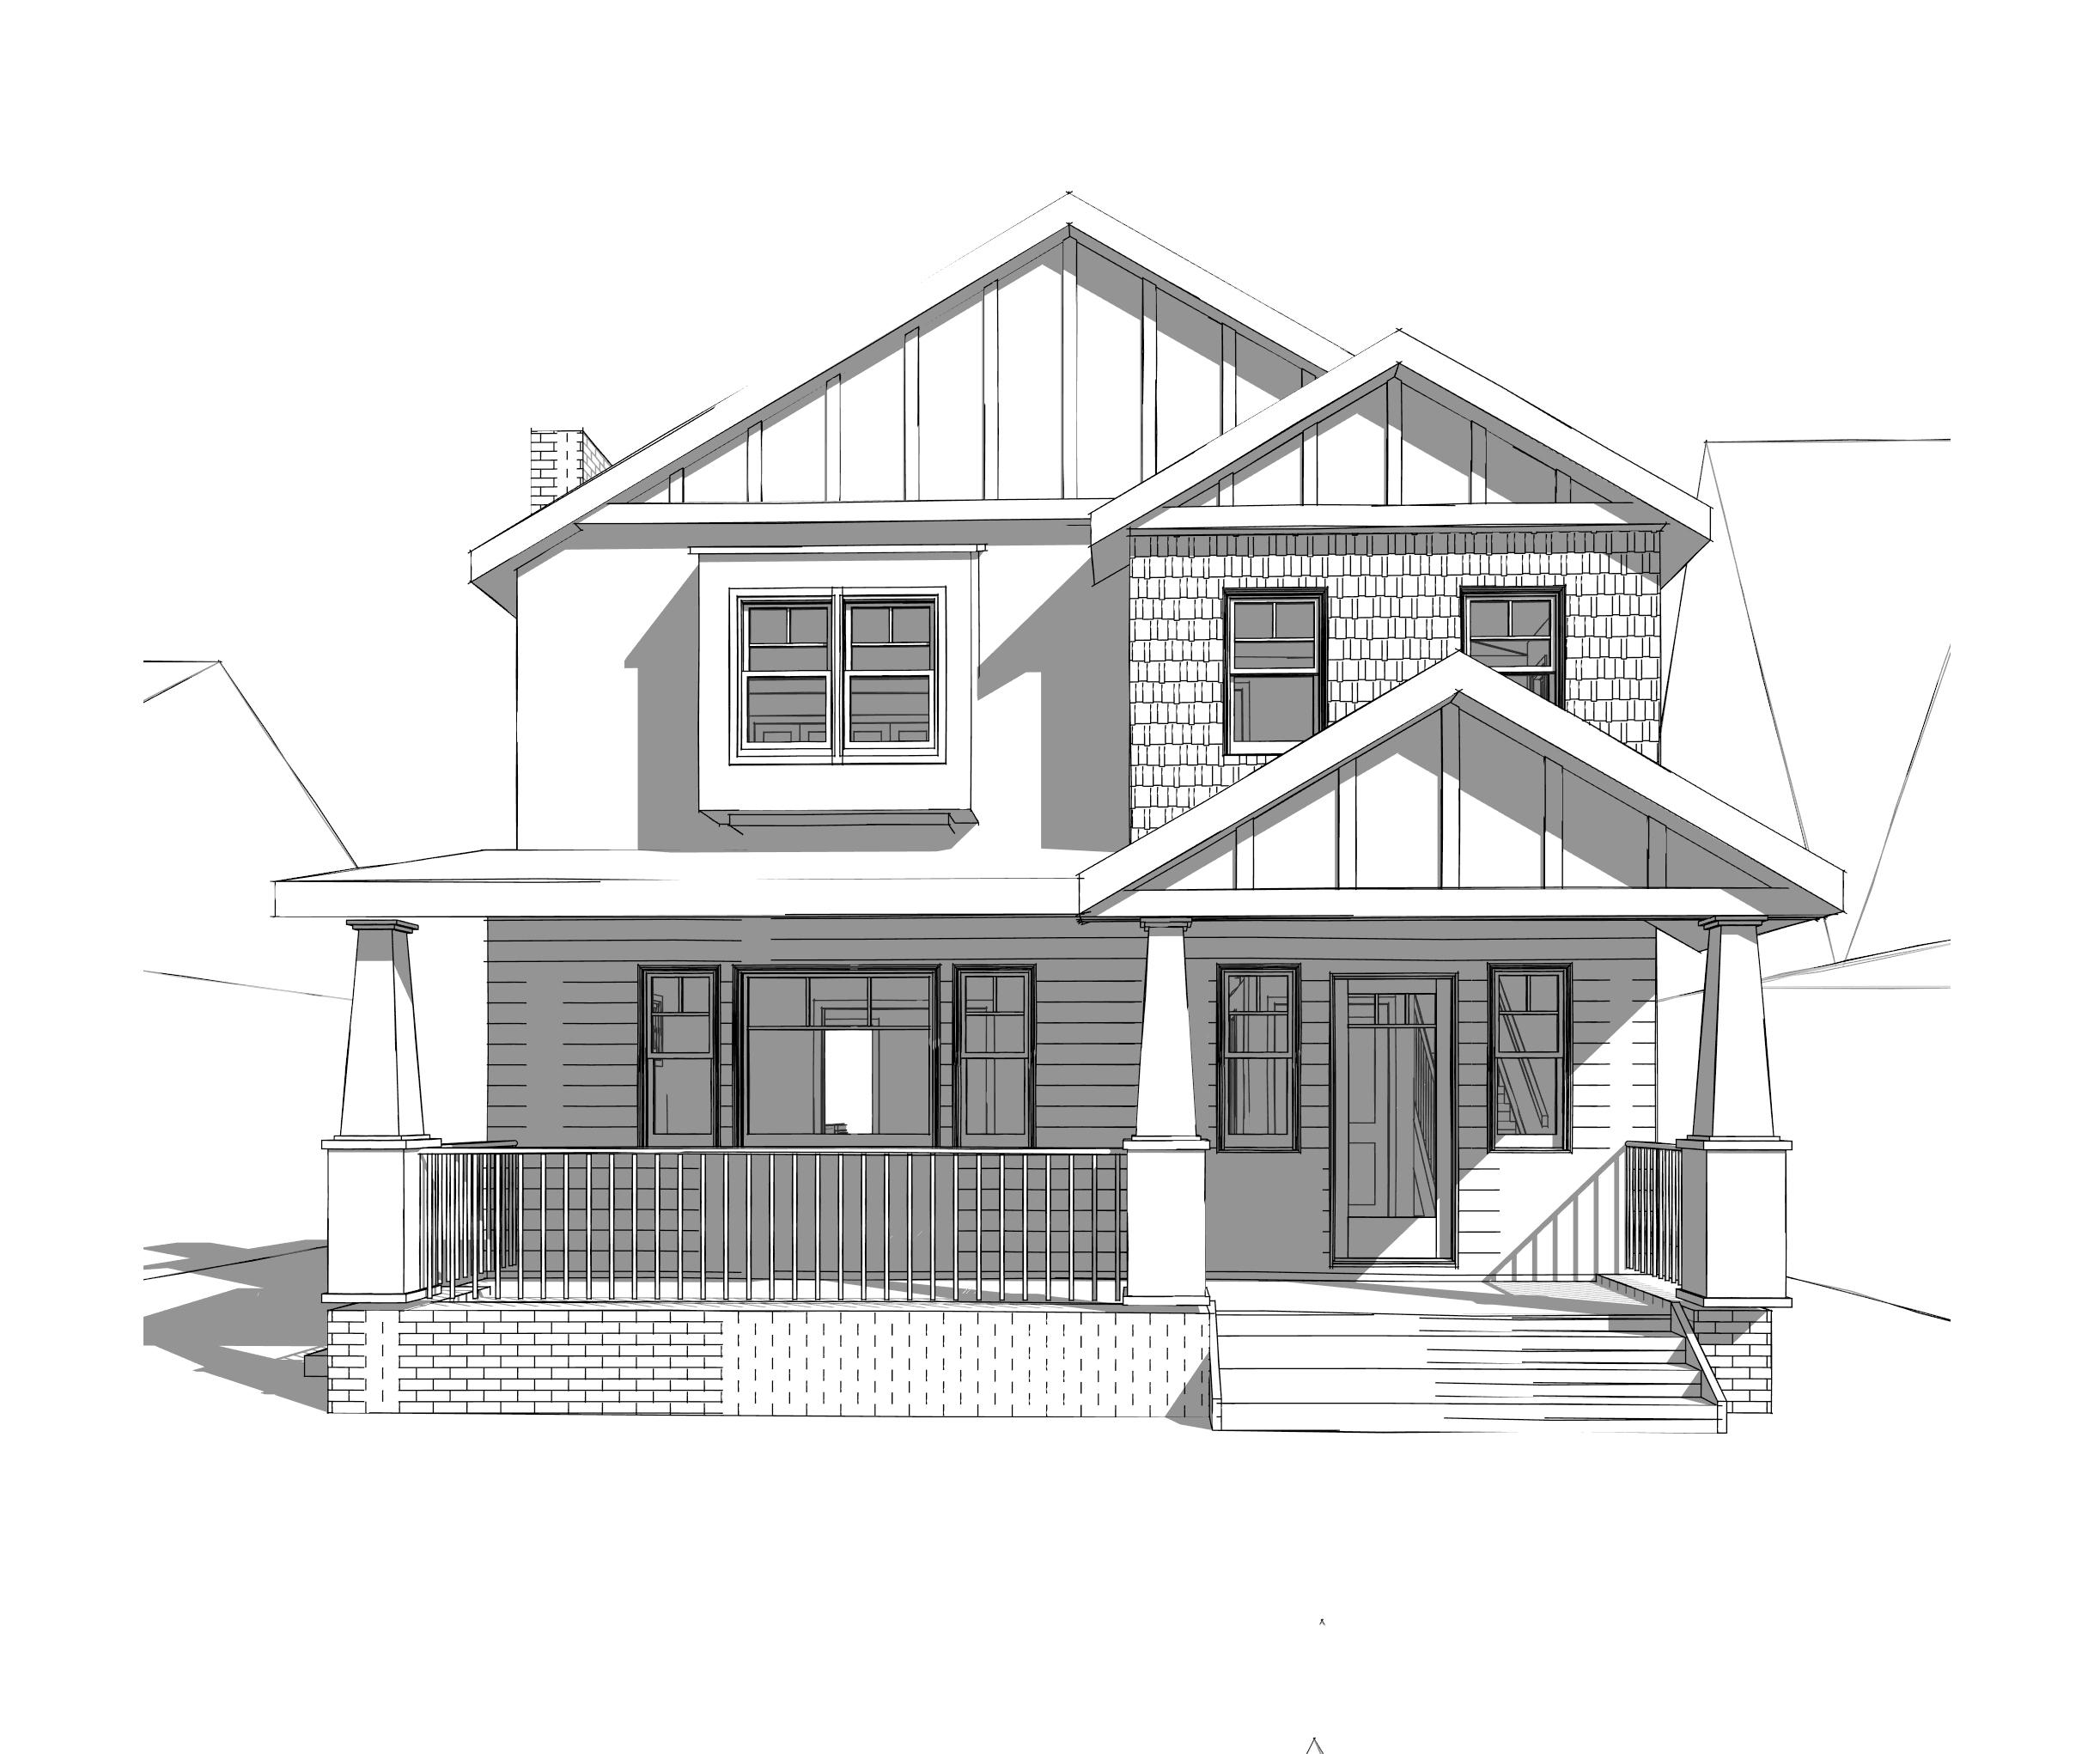 craftsman-final-desig-development-front-building-exterior-perspective.jpg